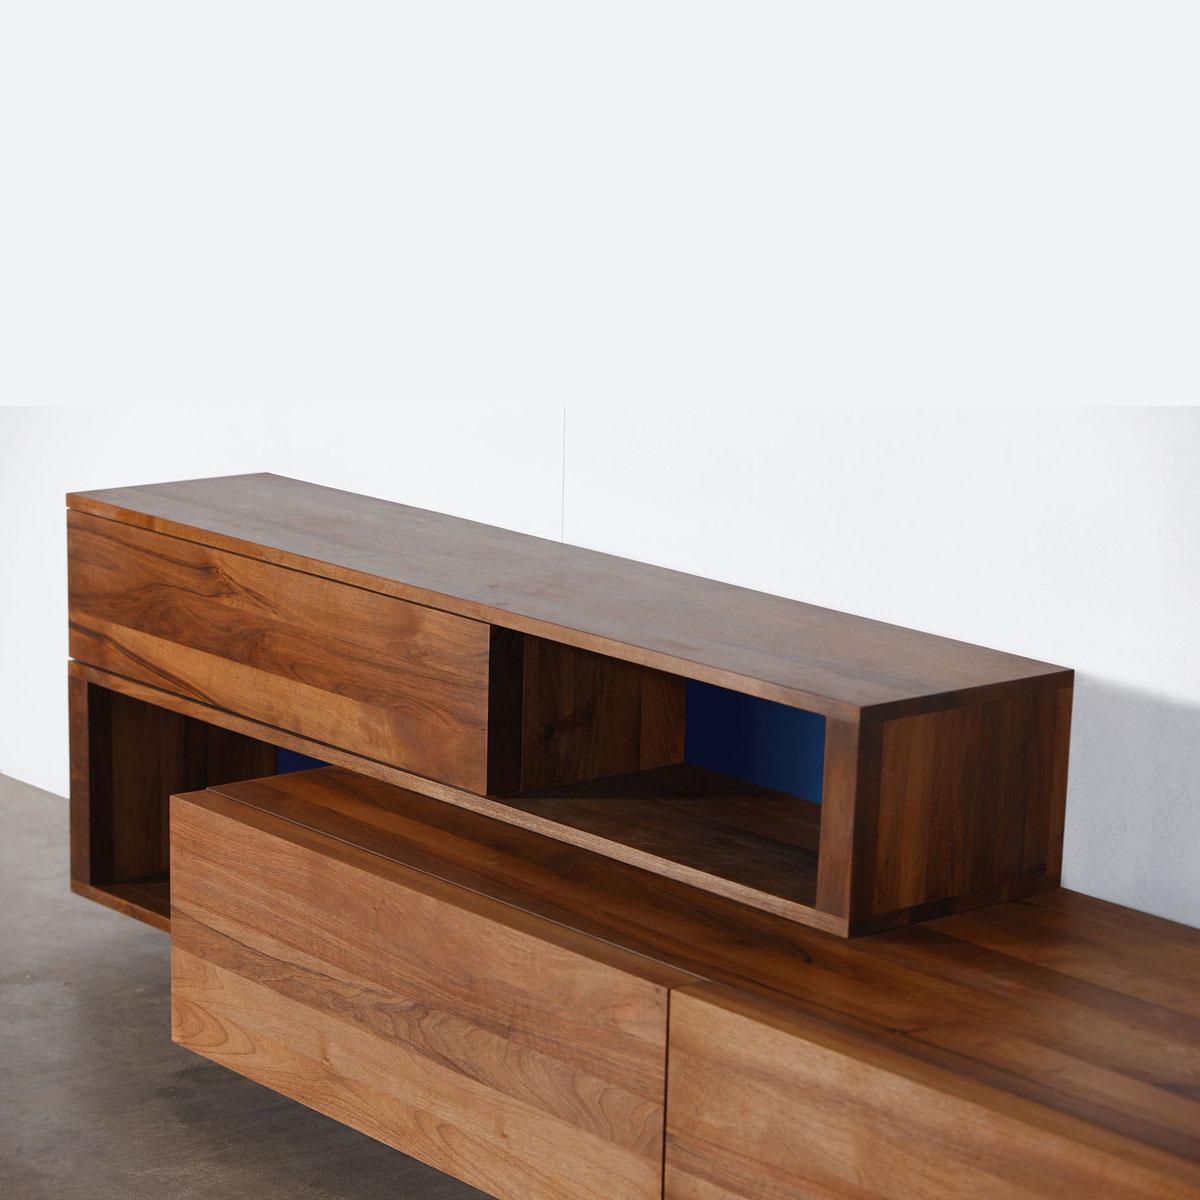 Mueble modular log de pared en madera moderno y artesano for Mueble modular